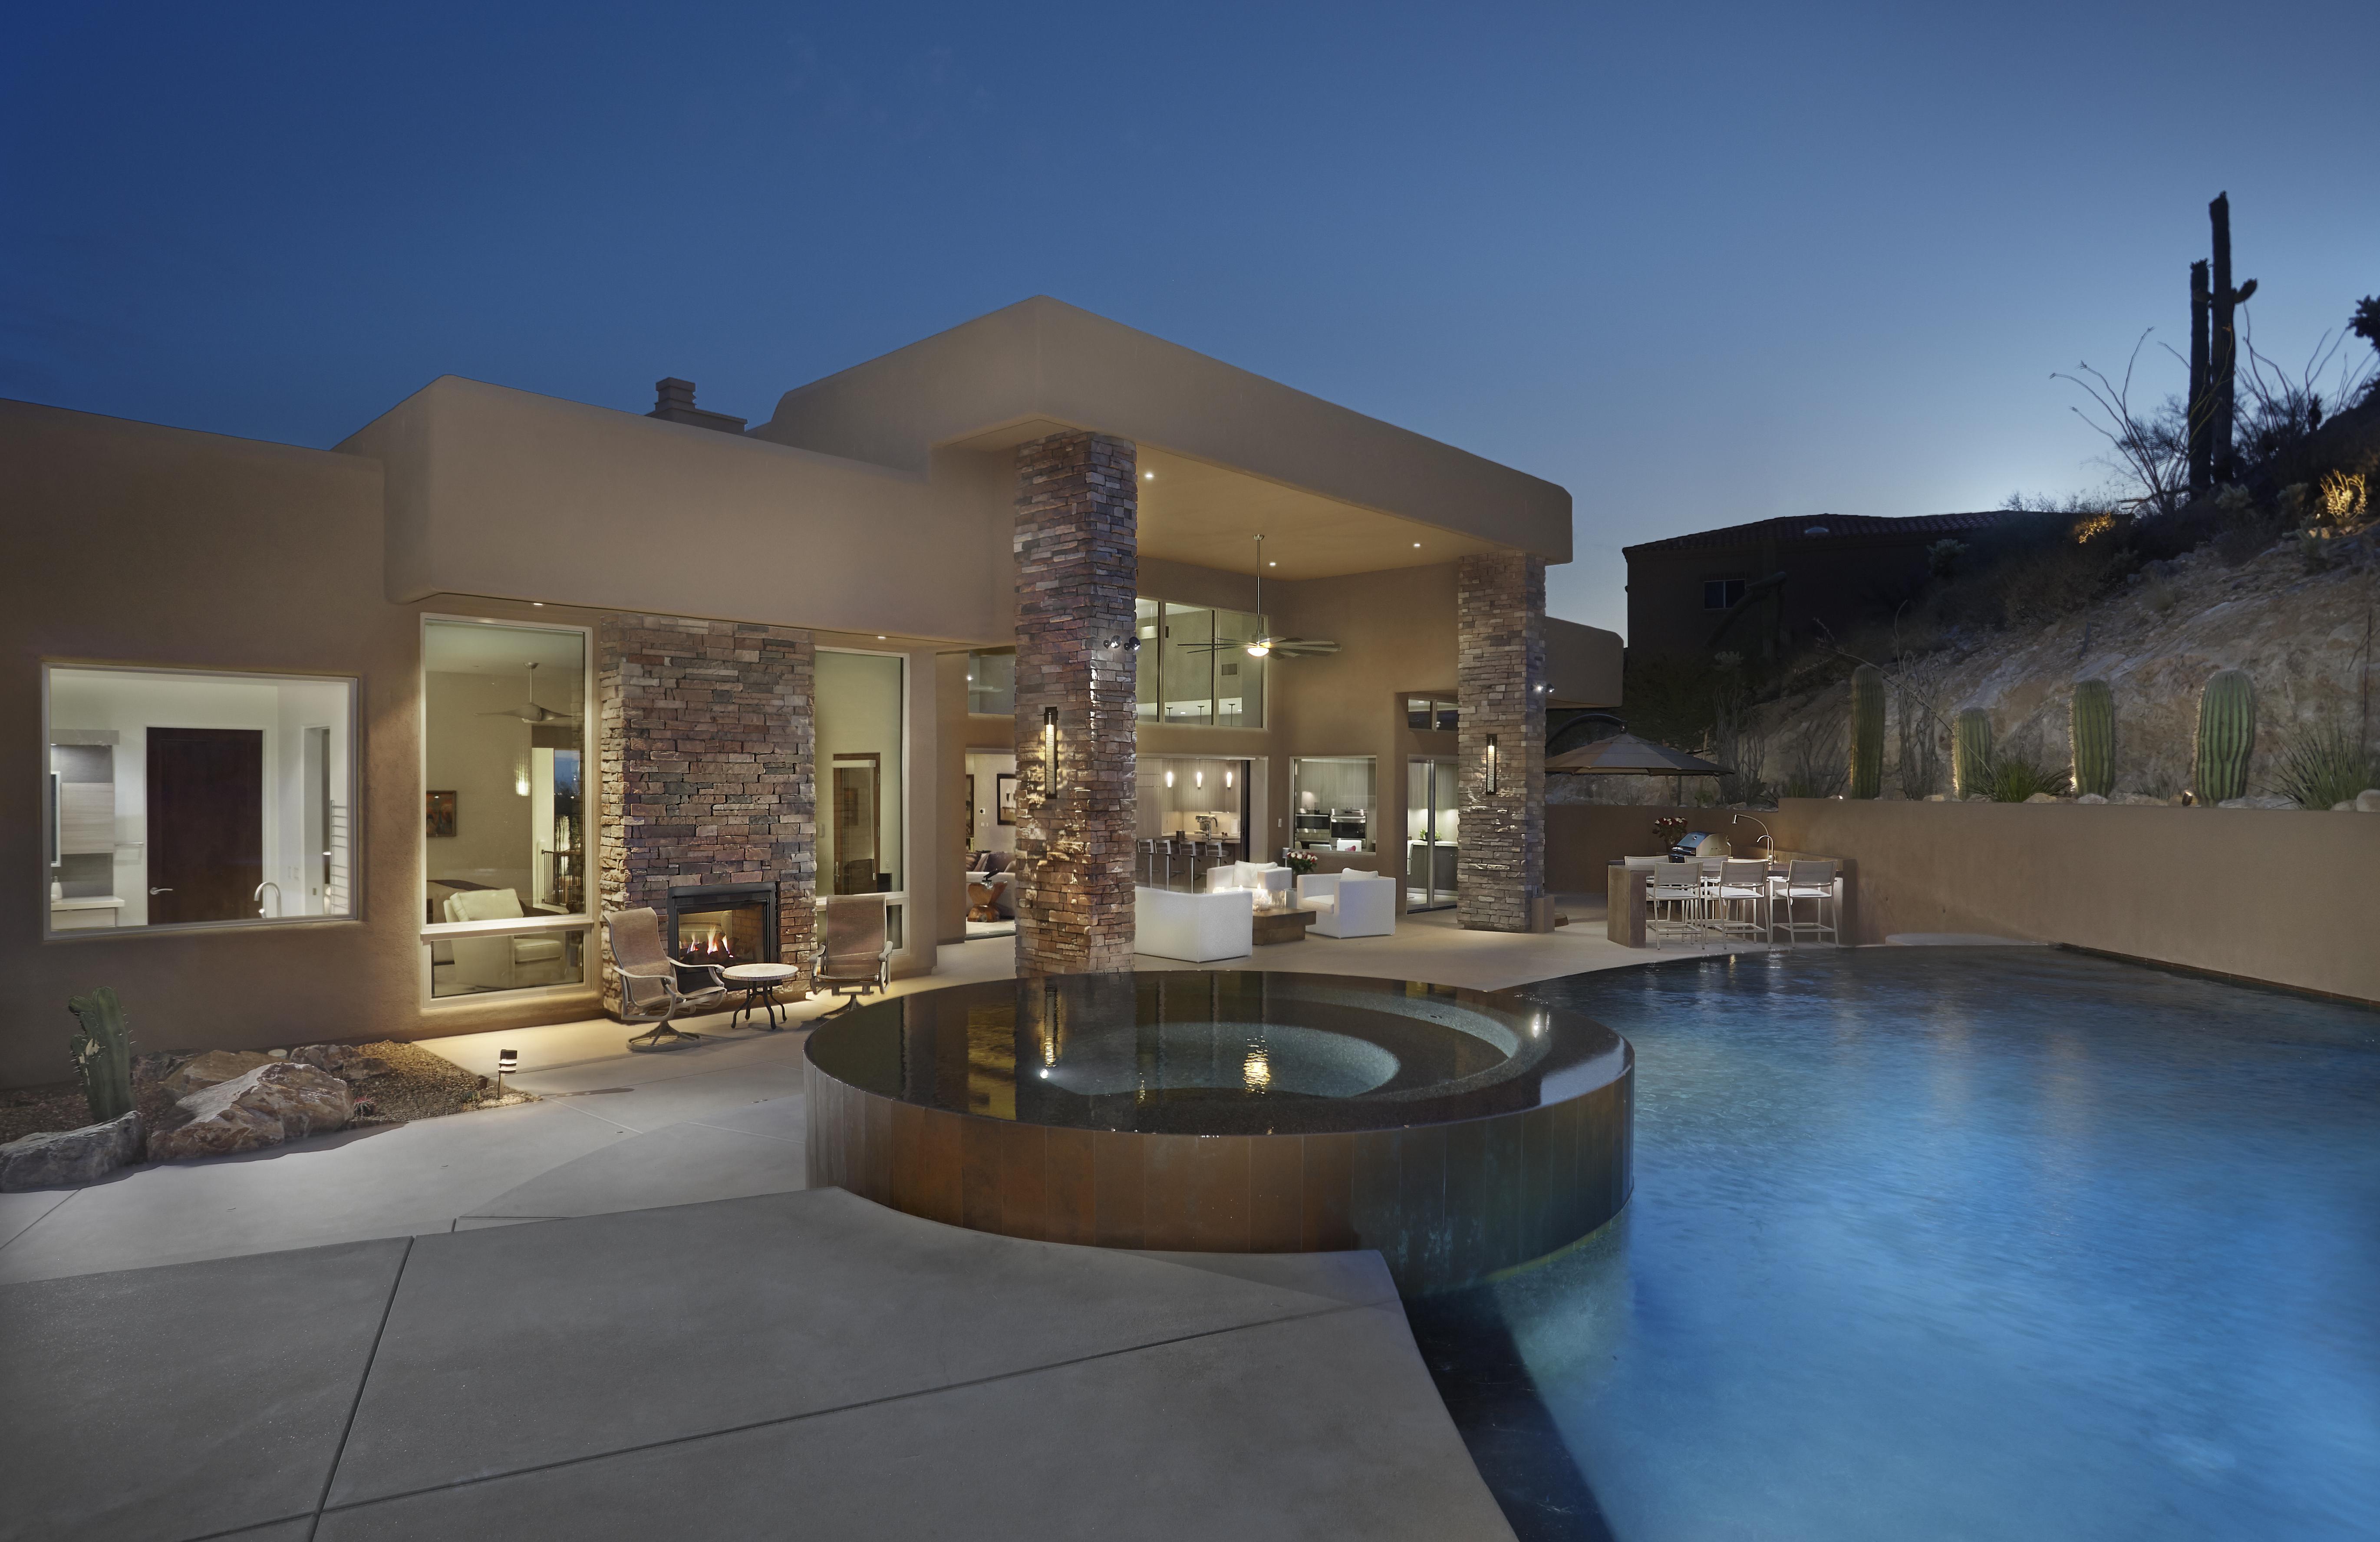 New Homes for Sale - Custom Homes